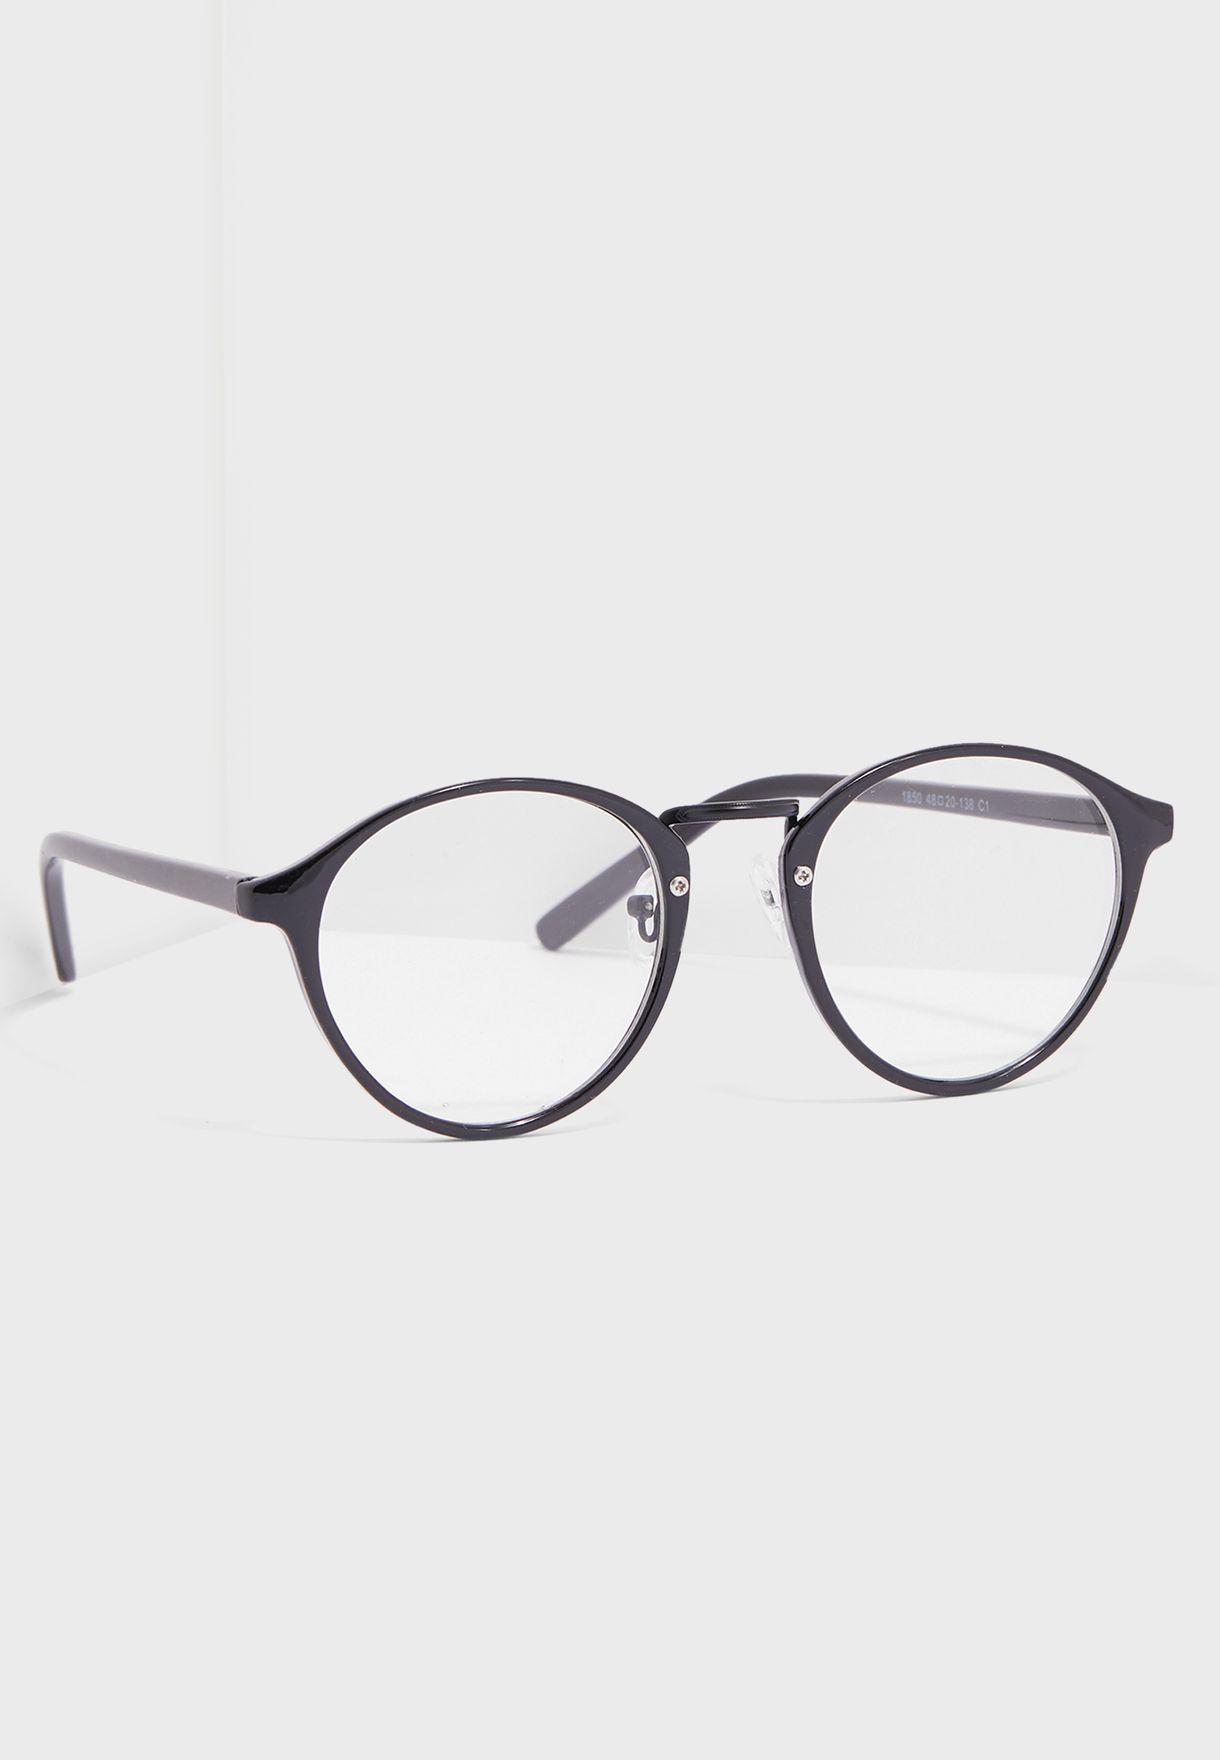 6e2a03d4b2fa Shop Seventy five black Clear Lens Optical Glasses 1850 for Men in ...